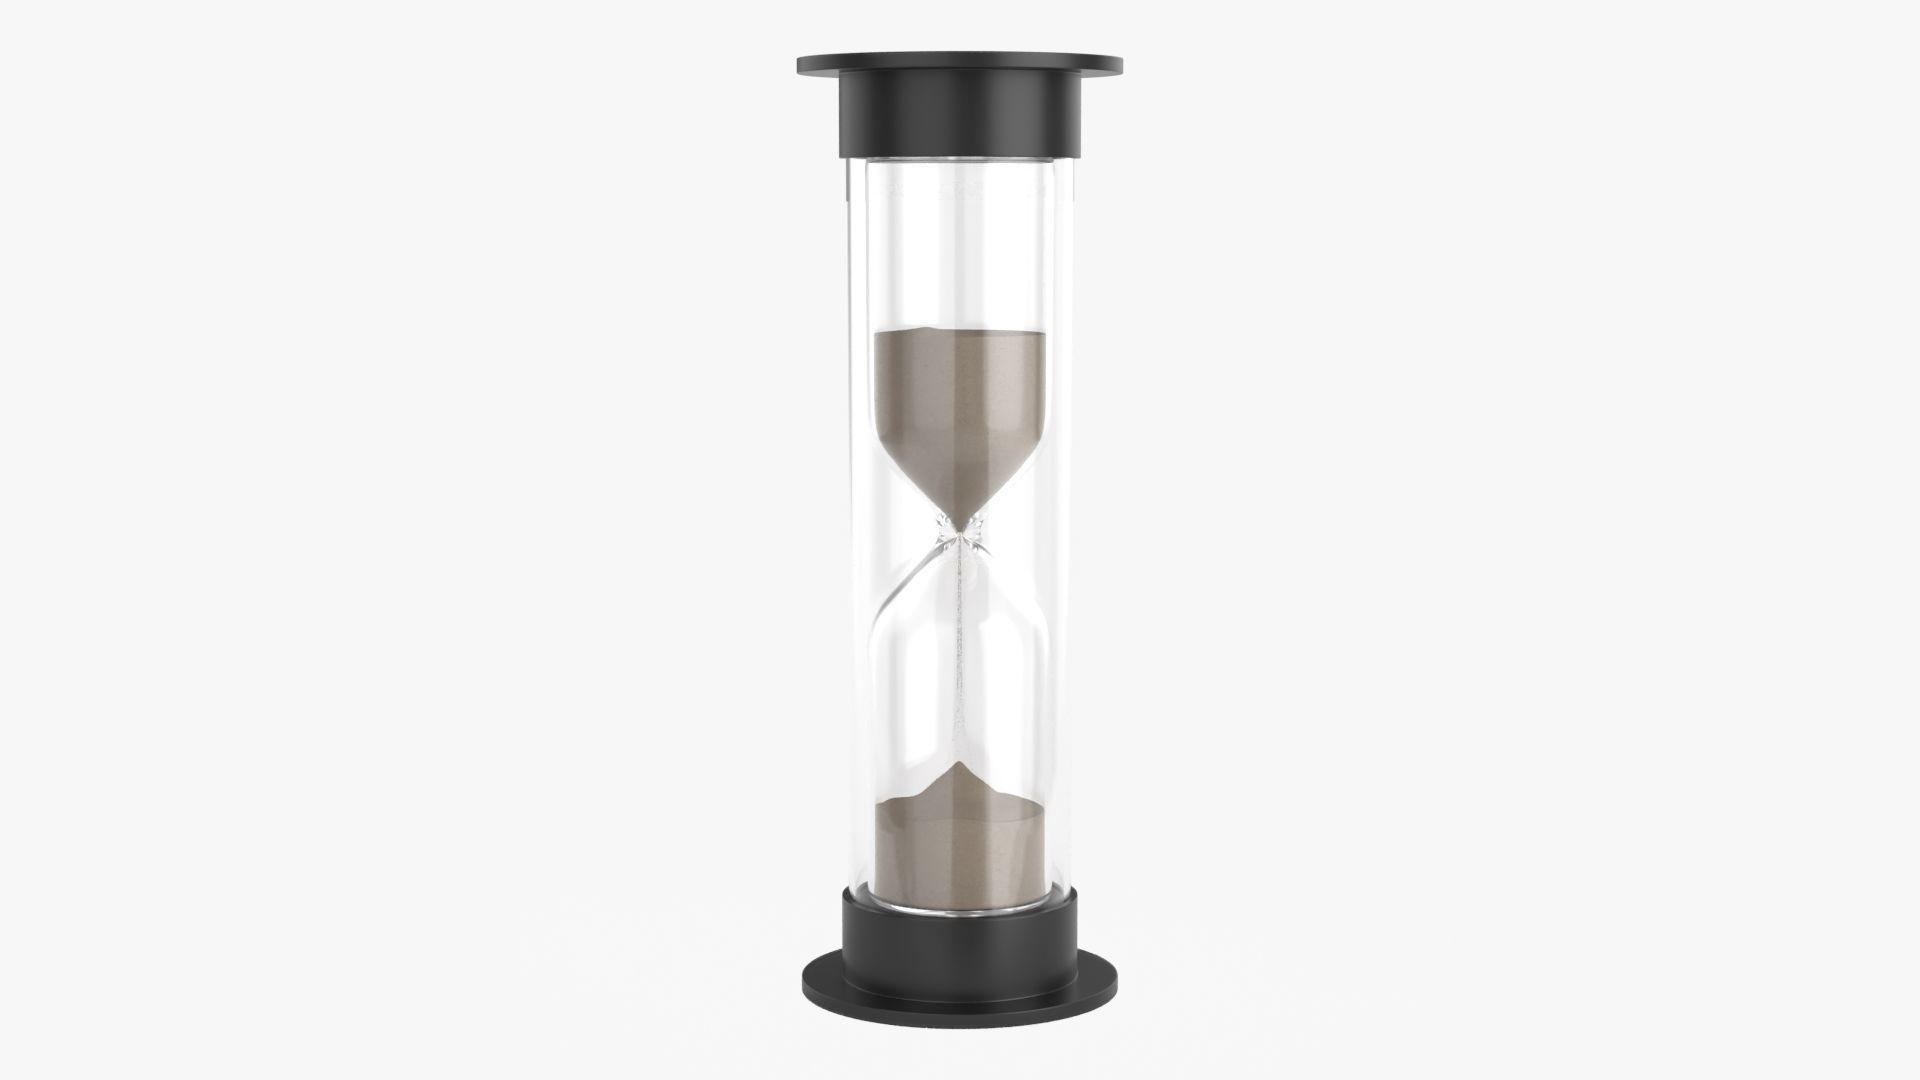 Hourglass sandglass egg sand timer cylindrical shape small